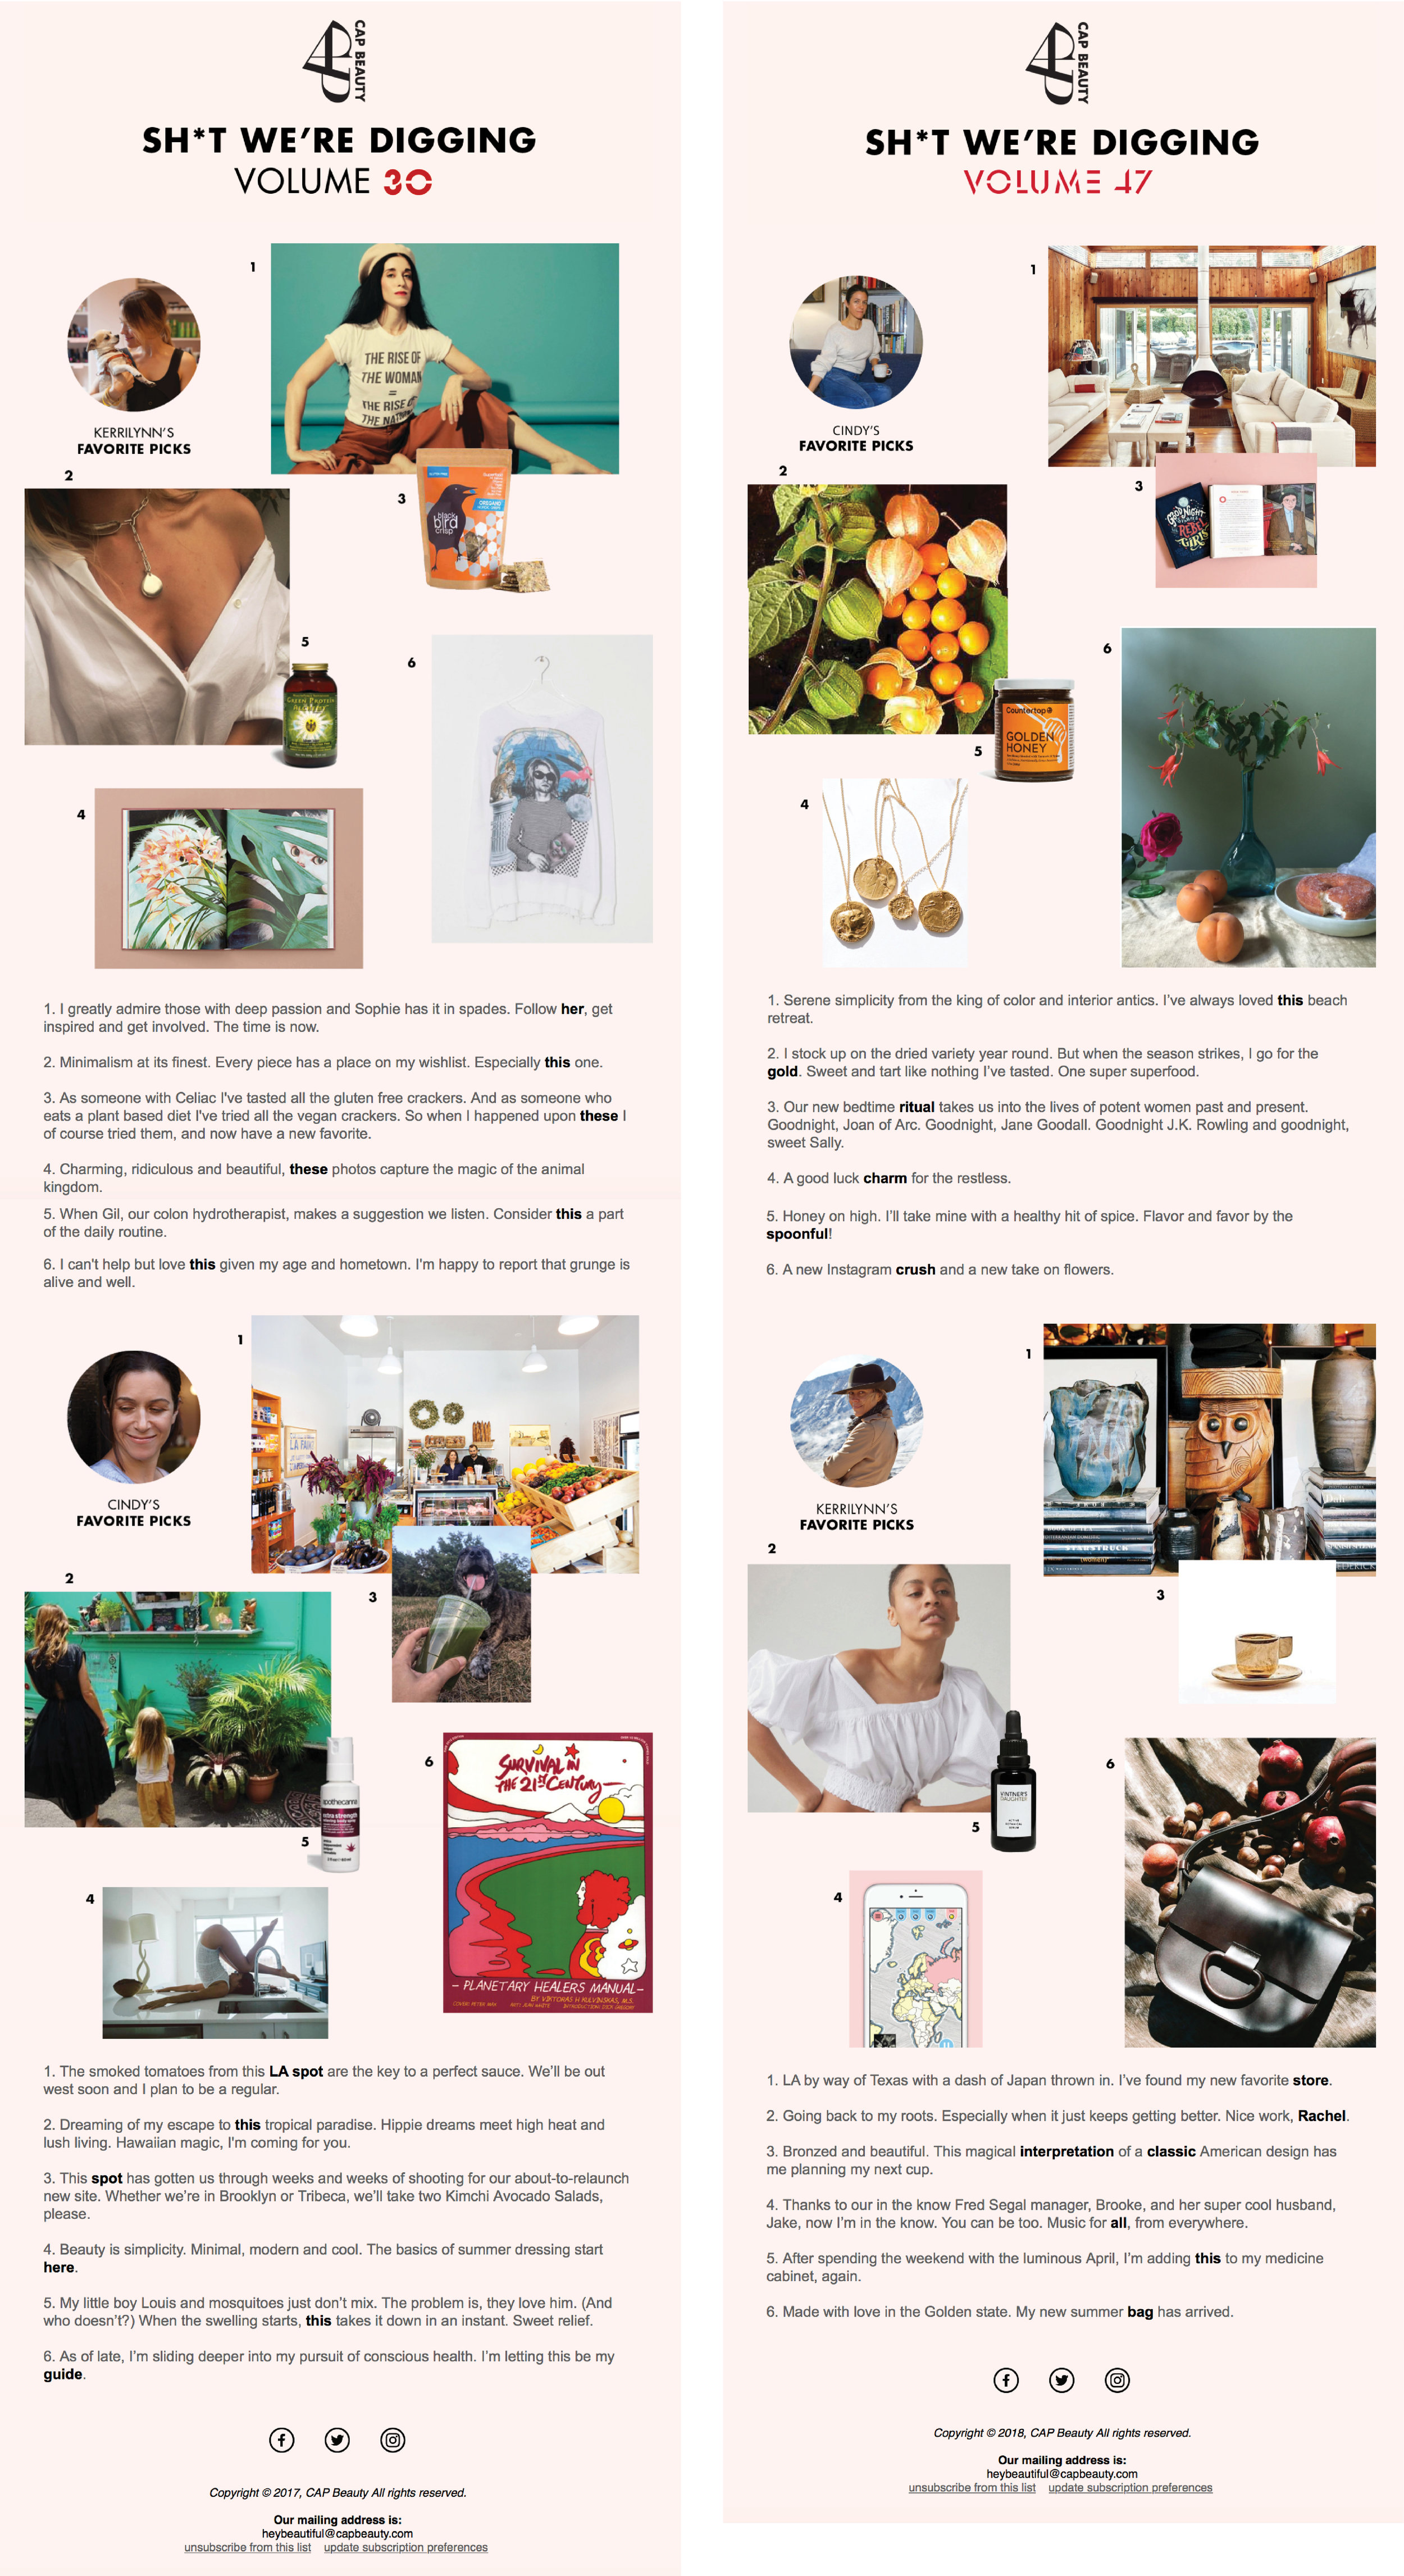 brittany-cutrone-newsletters-3.jpg